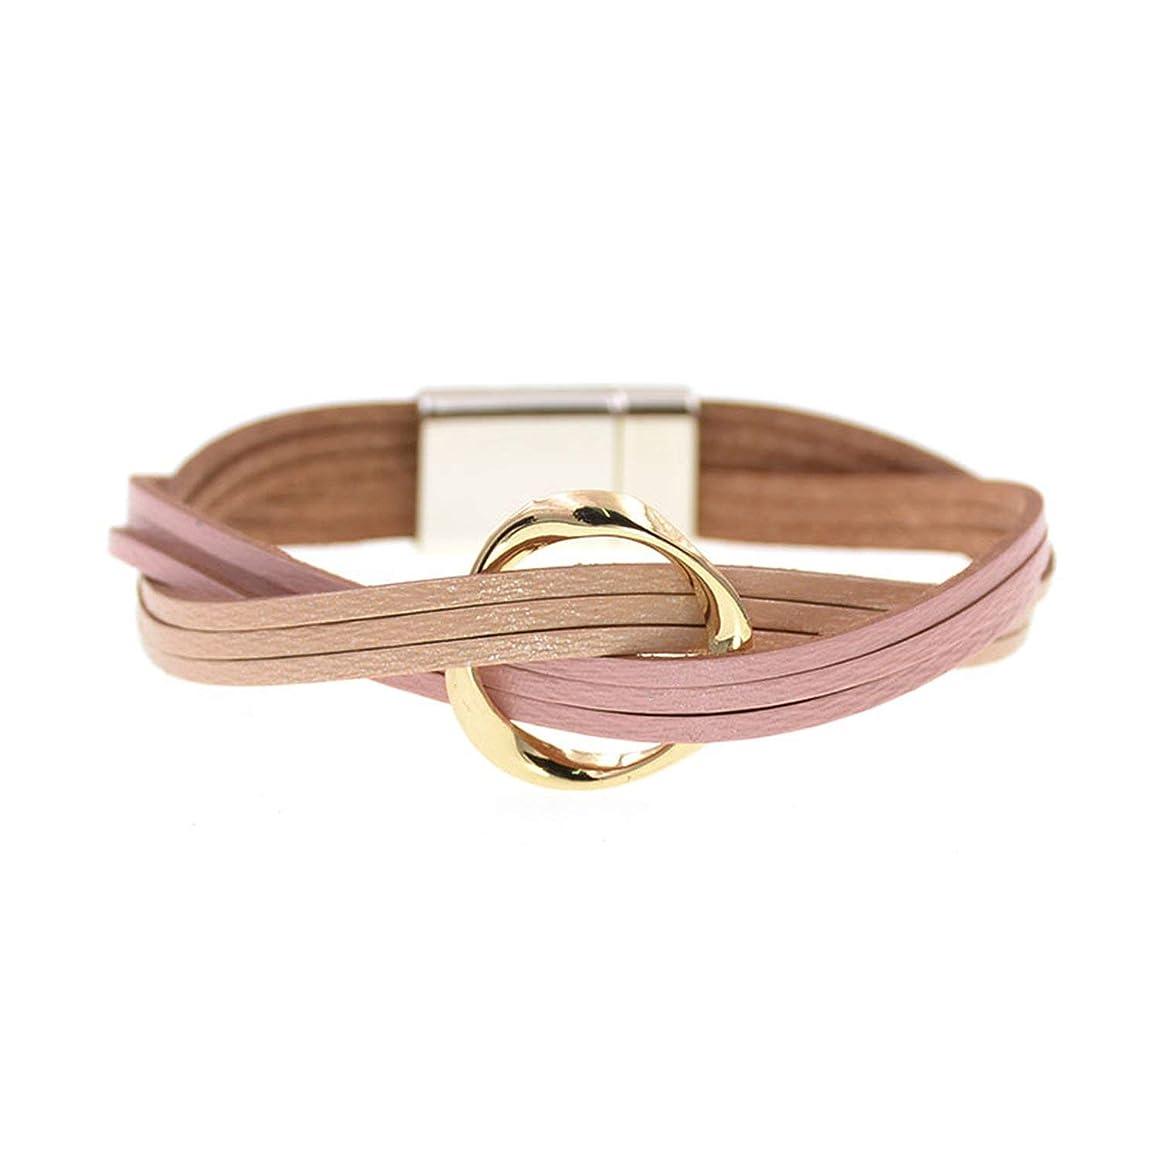 18 Colors Charm Leather Bracelets for Women & Men Multiple Layers wrap Bracelets Couple Gifts Fashion Jewelry,Pink Beige,19cm